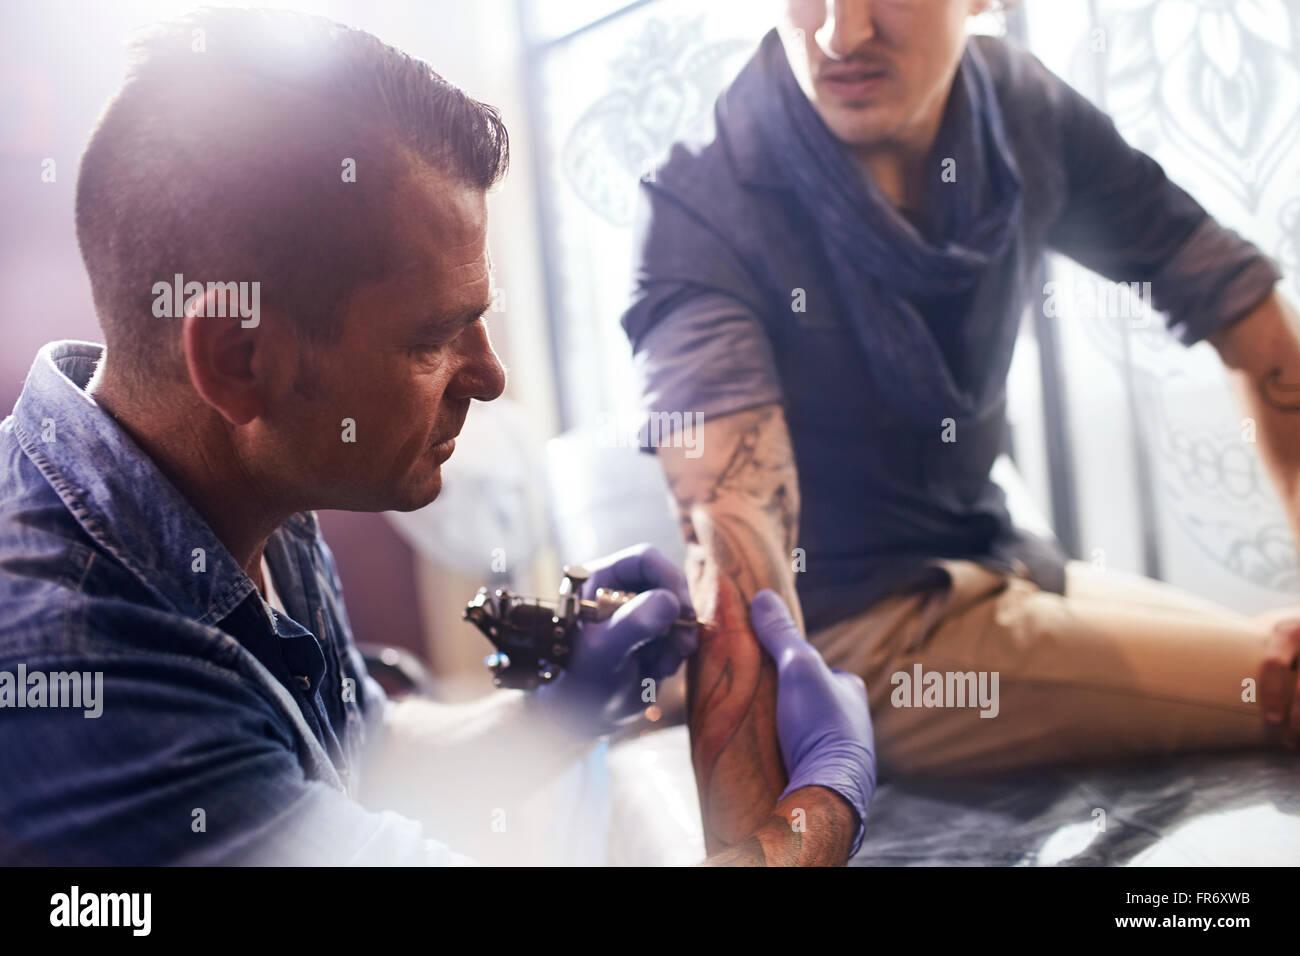 Tattoo artist tattooing man's forearm - Stock Image